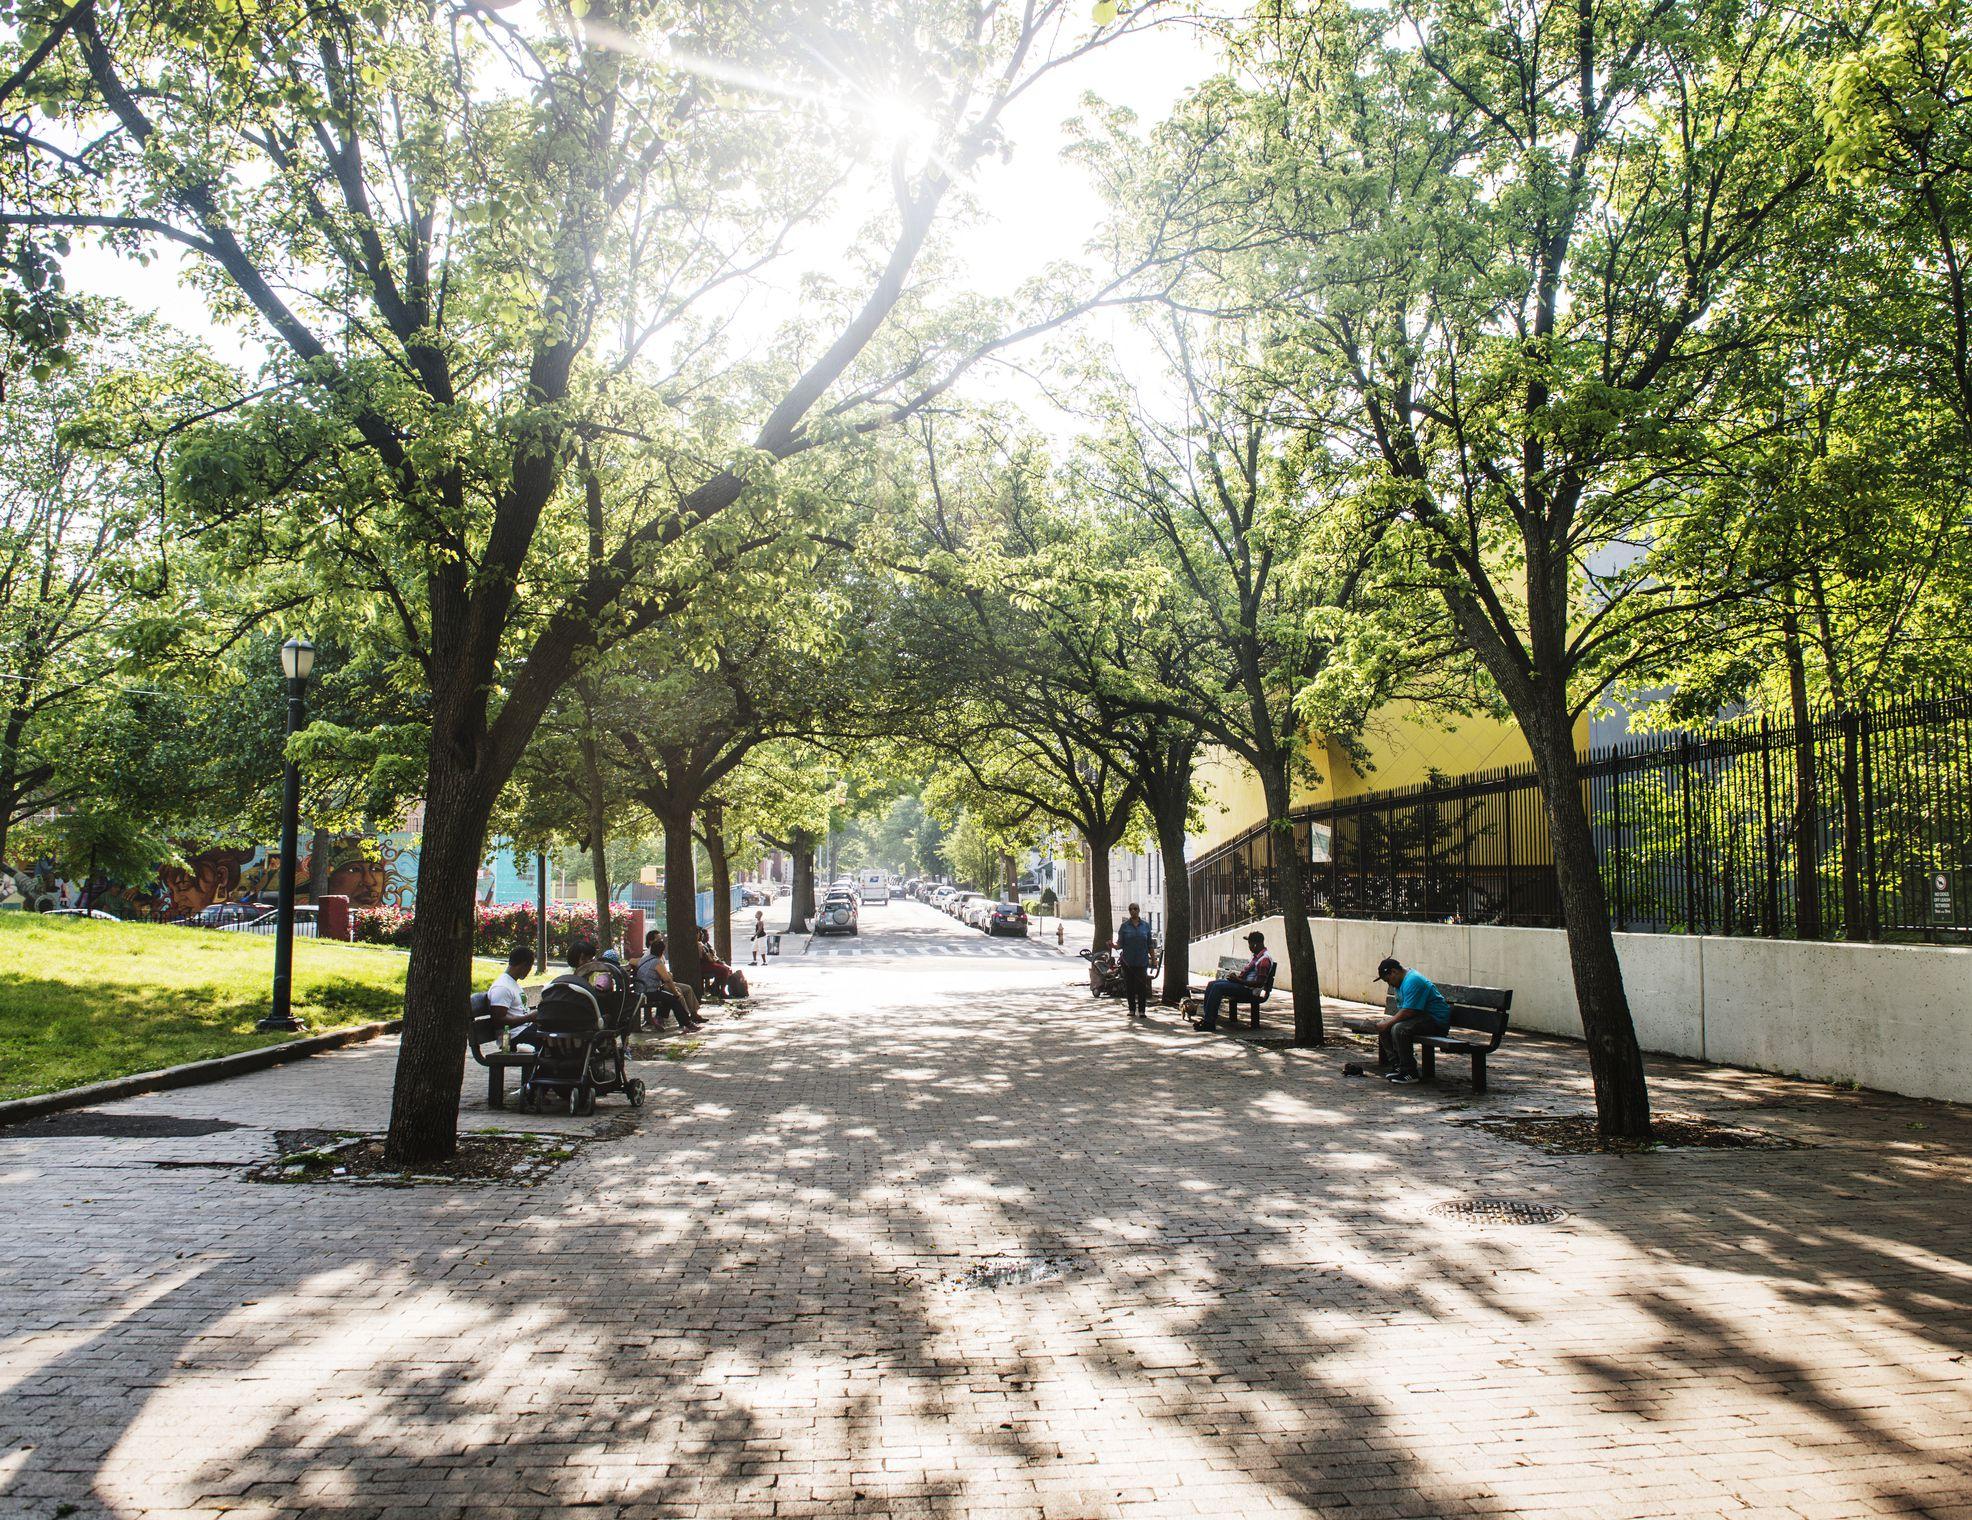 Brower park in Crown Heights, Brooklyn, New York